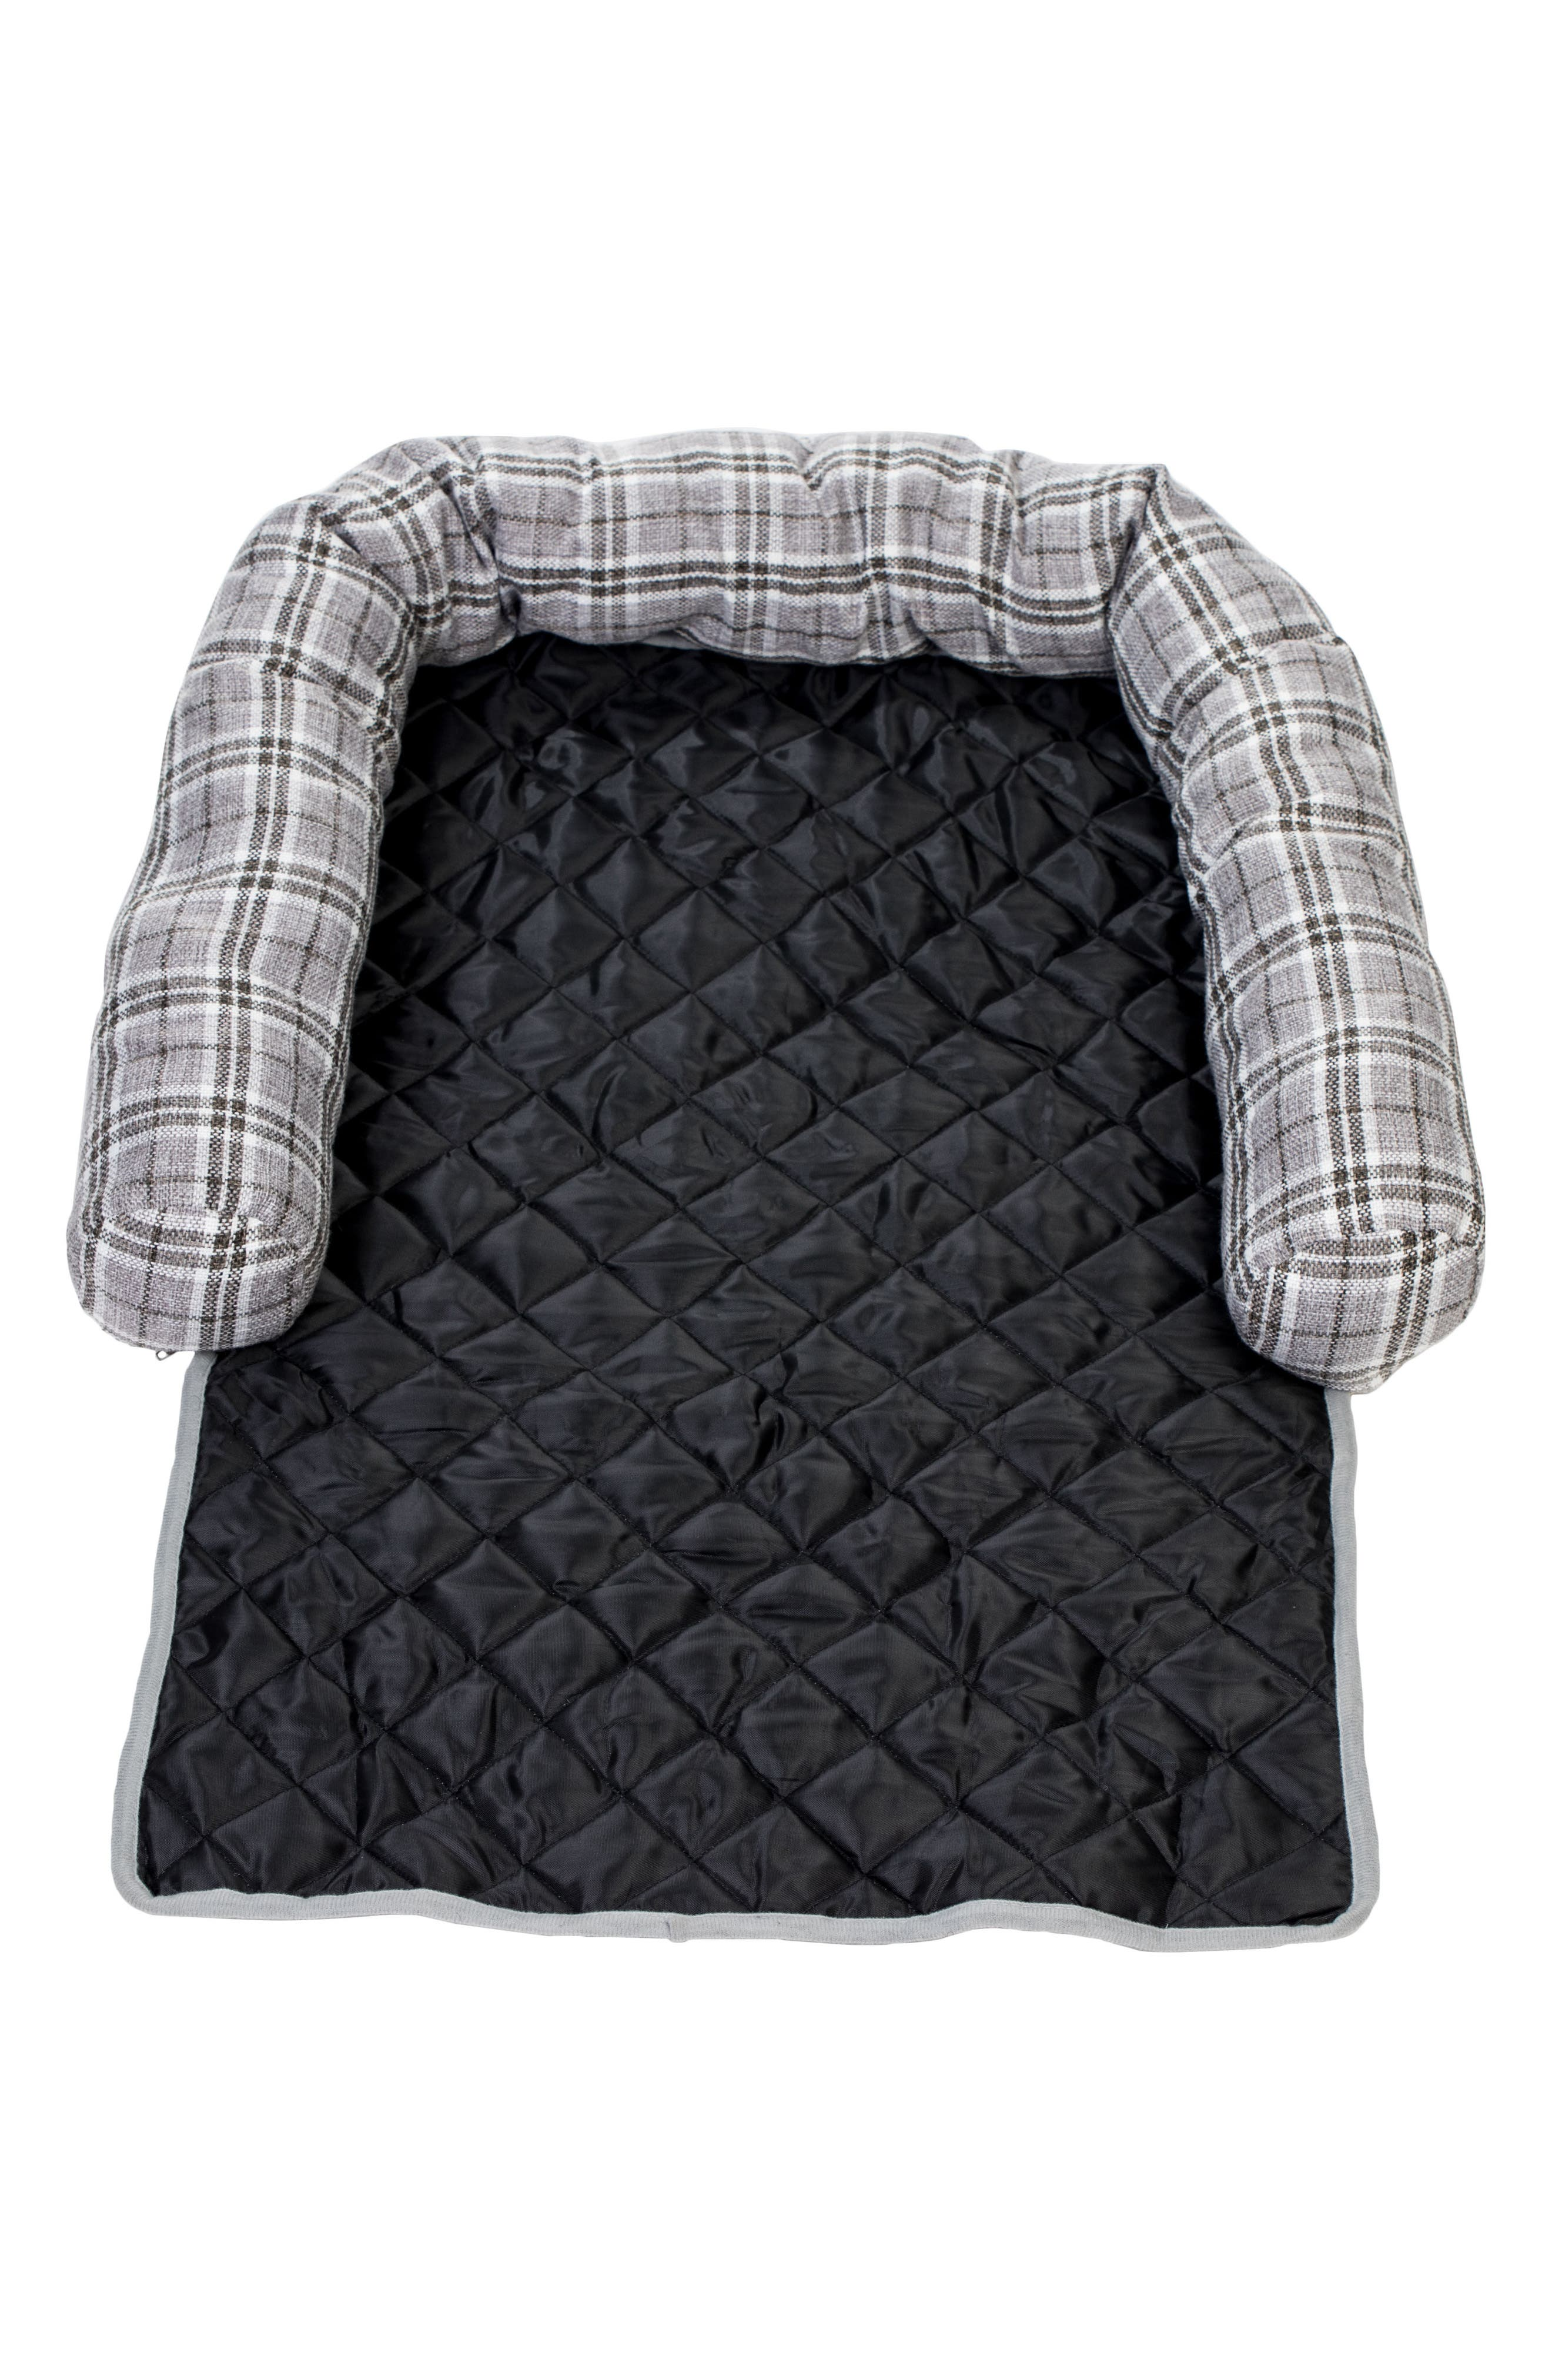 Harlee Reversible Pet Chair Cover,                             Alternate thumbnail 2, color,                             Grey